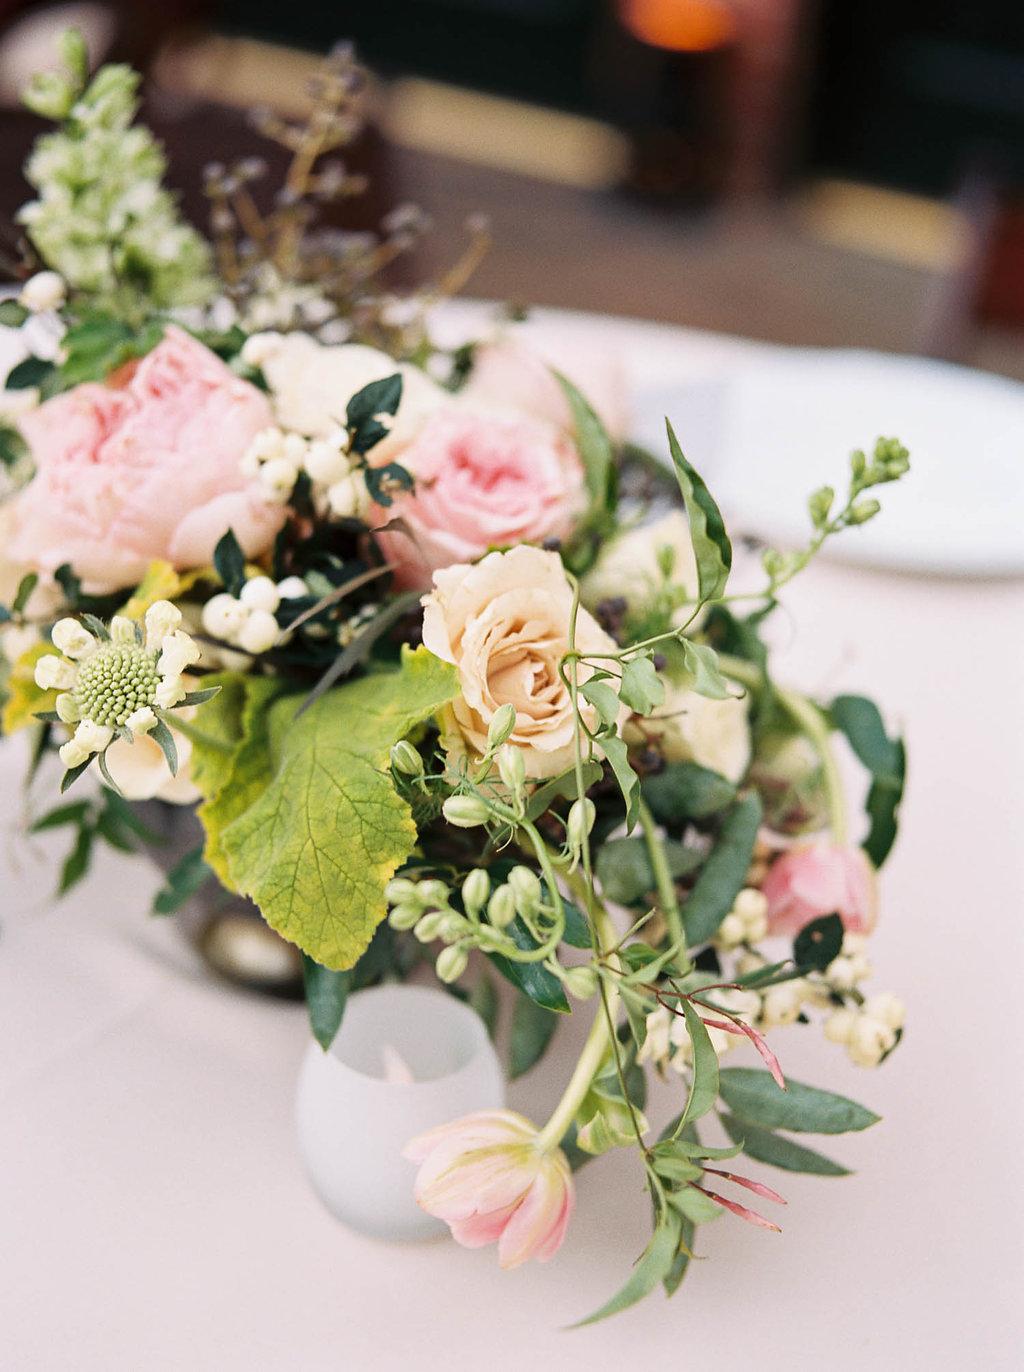 Cheekwood Botanical Garden Wedding // Blush and greenery centerpiece